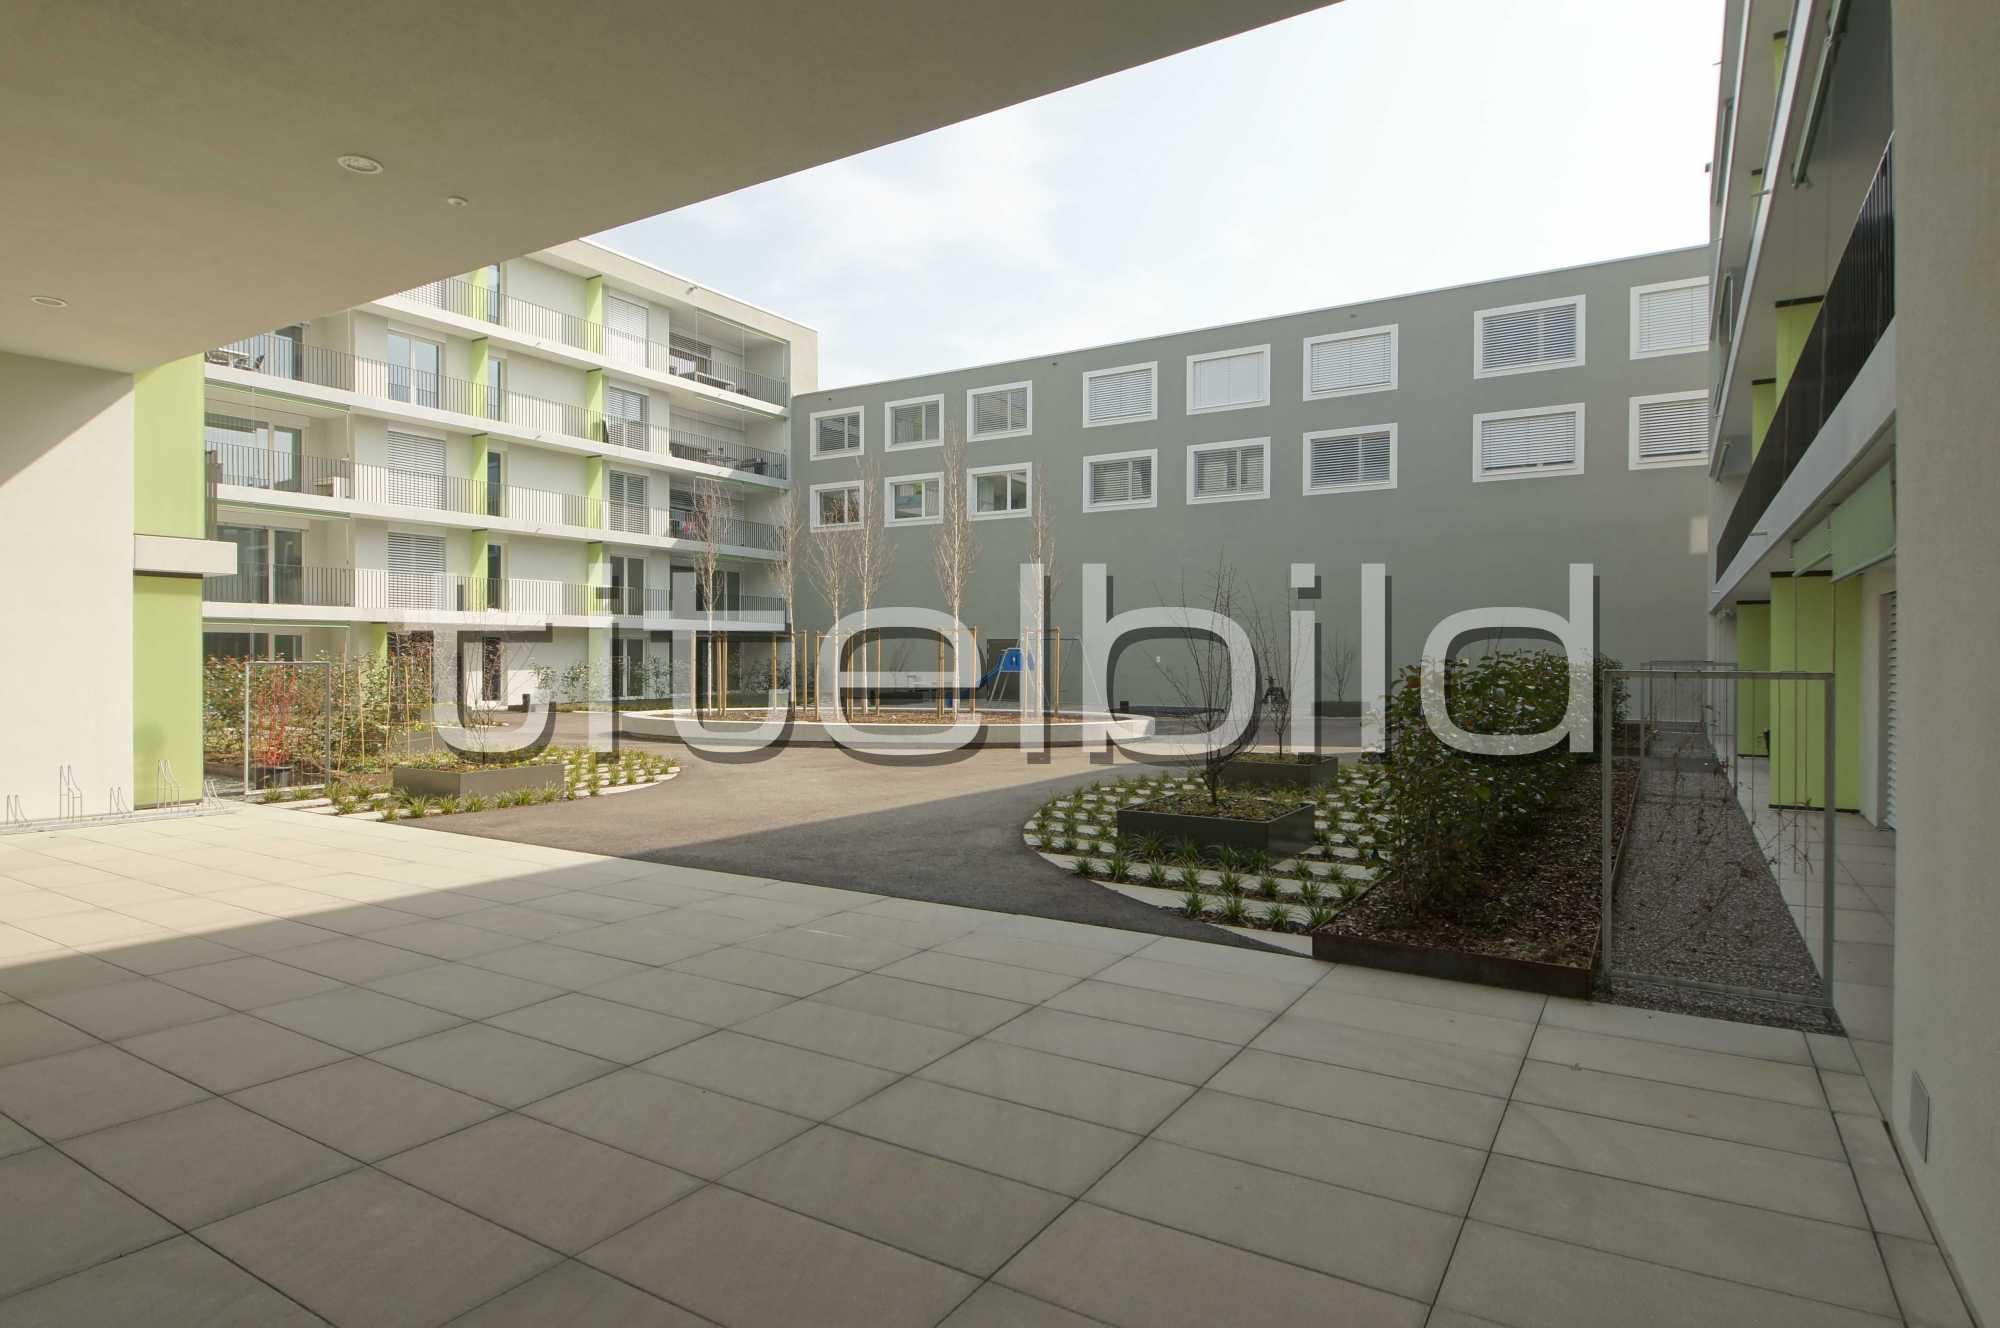 Projektbild-Nr. 2: Breitenpark